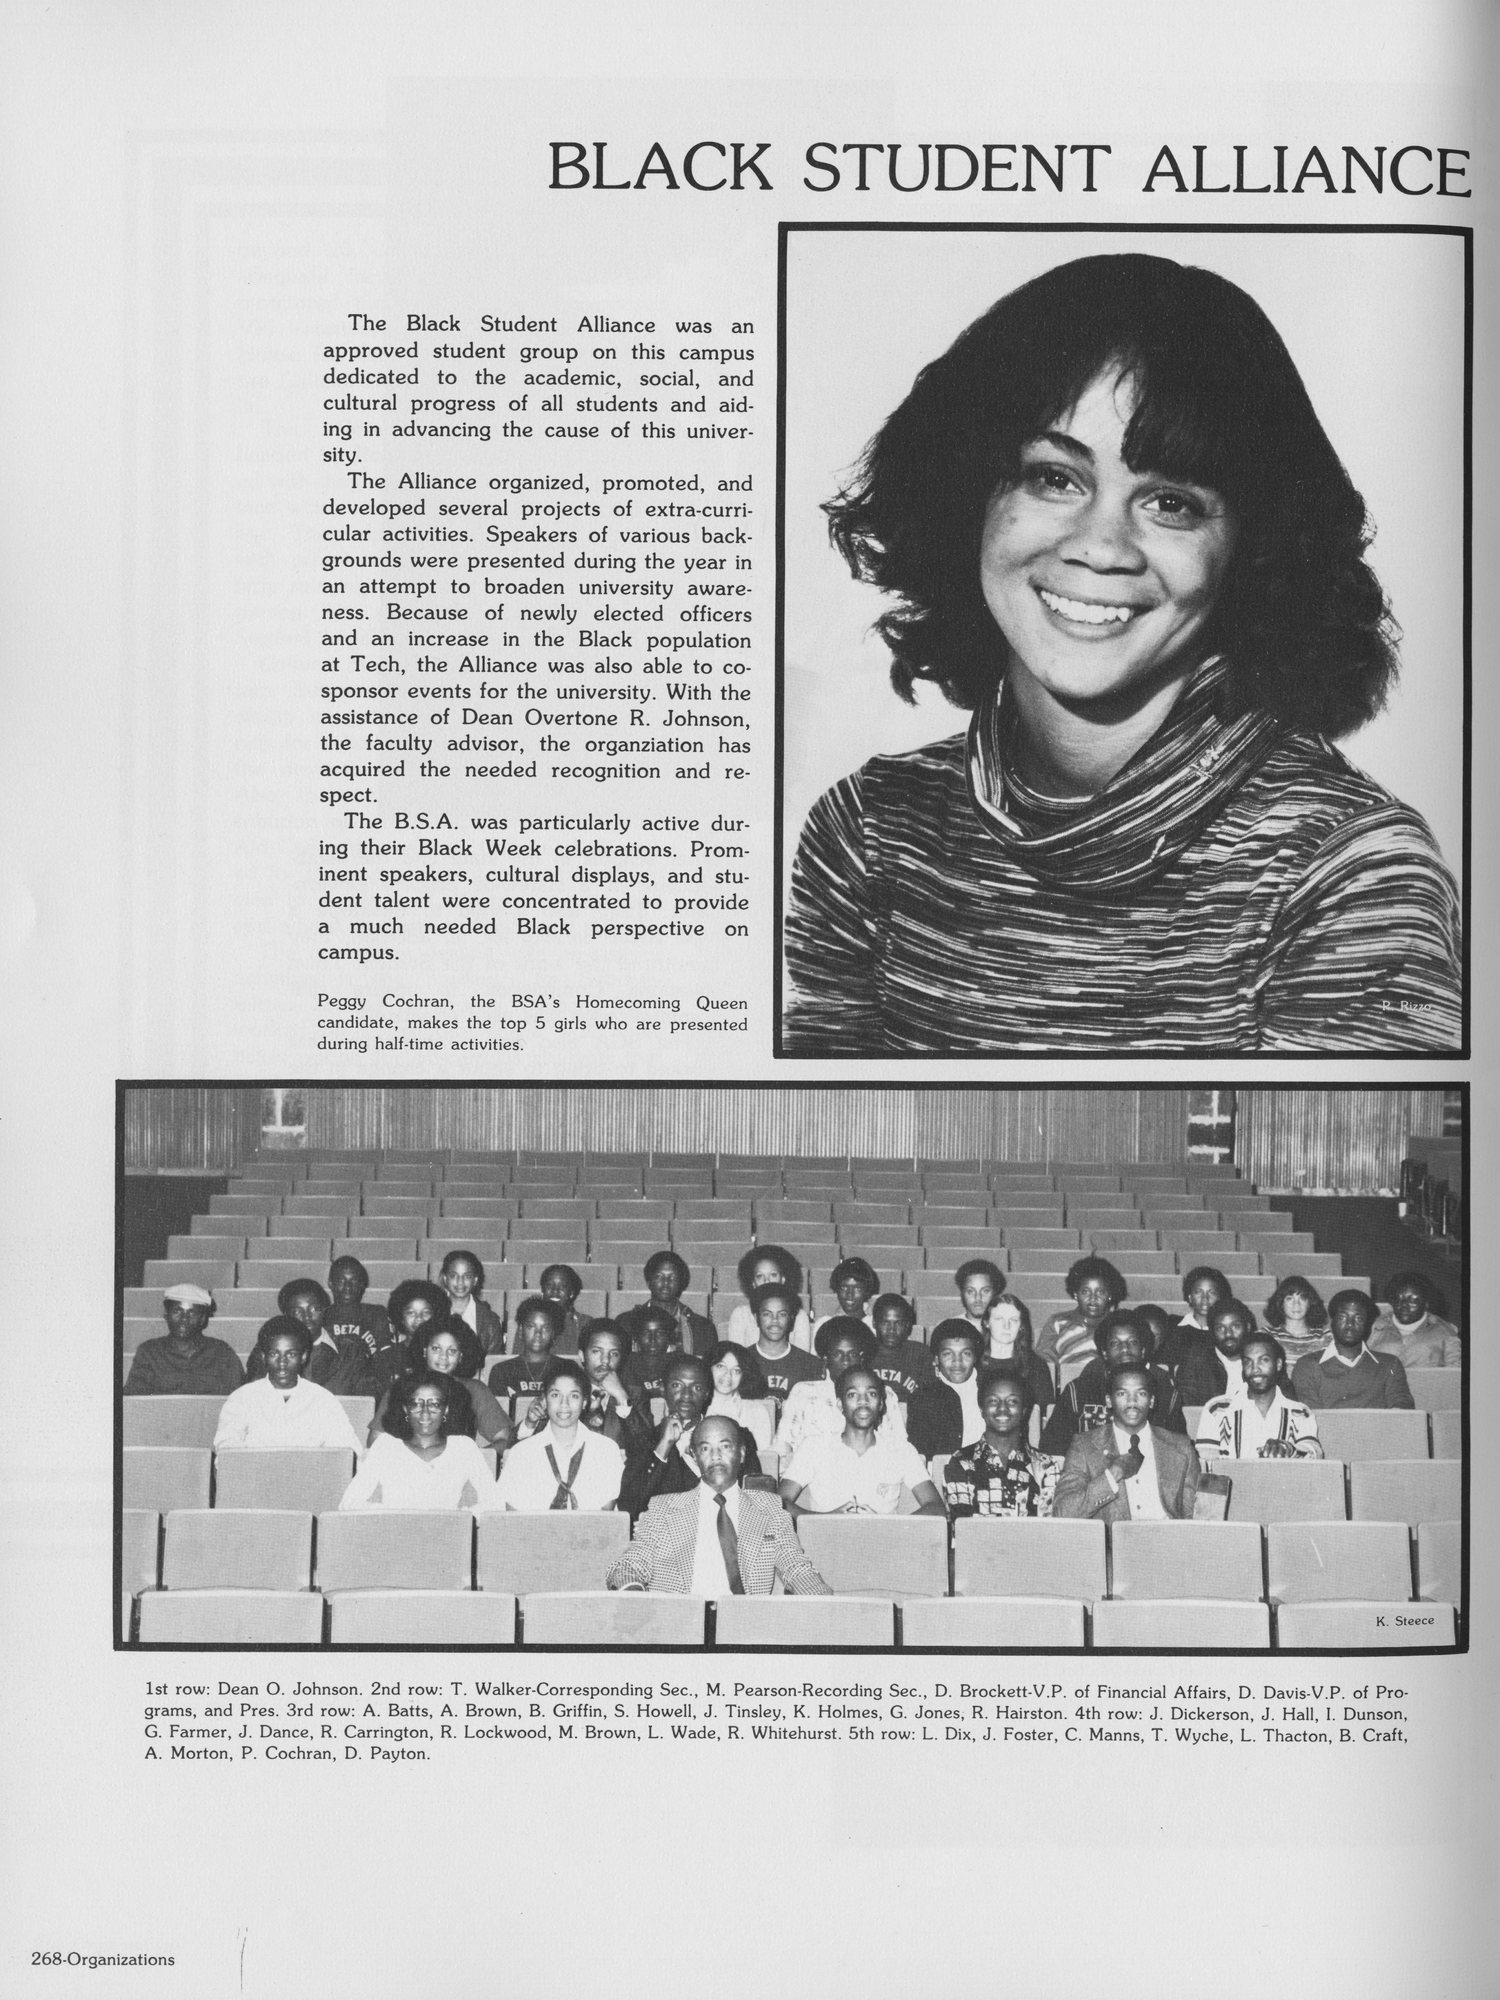 http://spec.lib.vt.edu/pickup/Omeka_upload/1979_Bugle_pg268_BSA.jpg